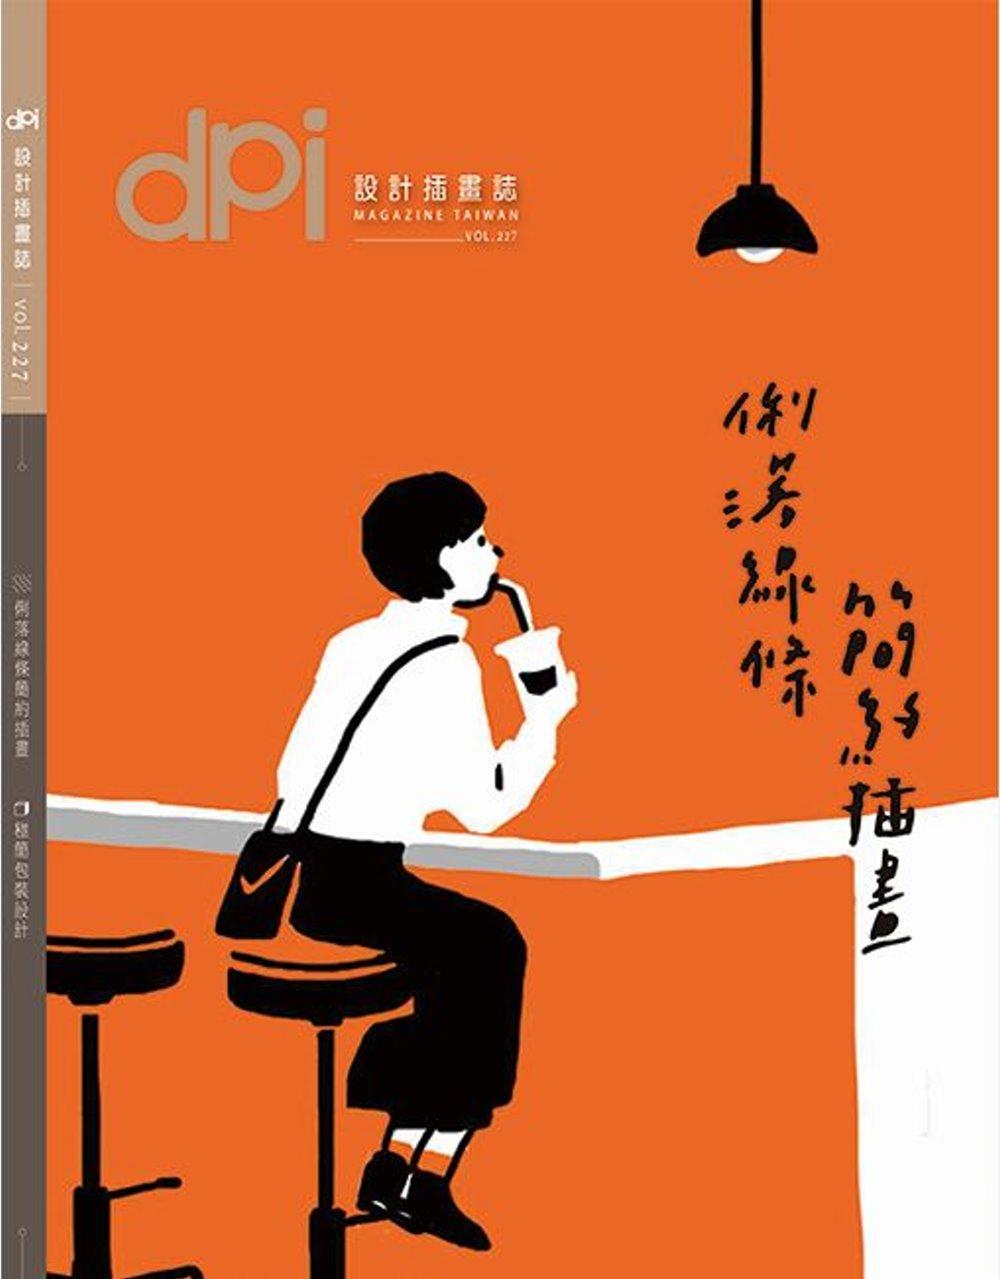 dpi設計插畫誌 3月號/2018 第227期